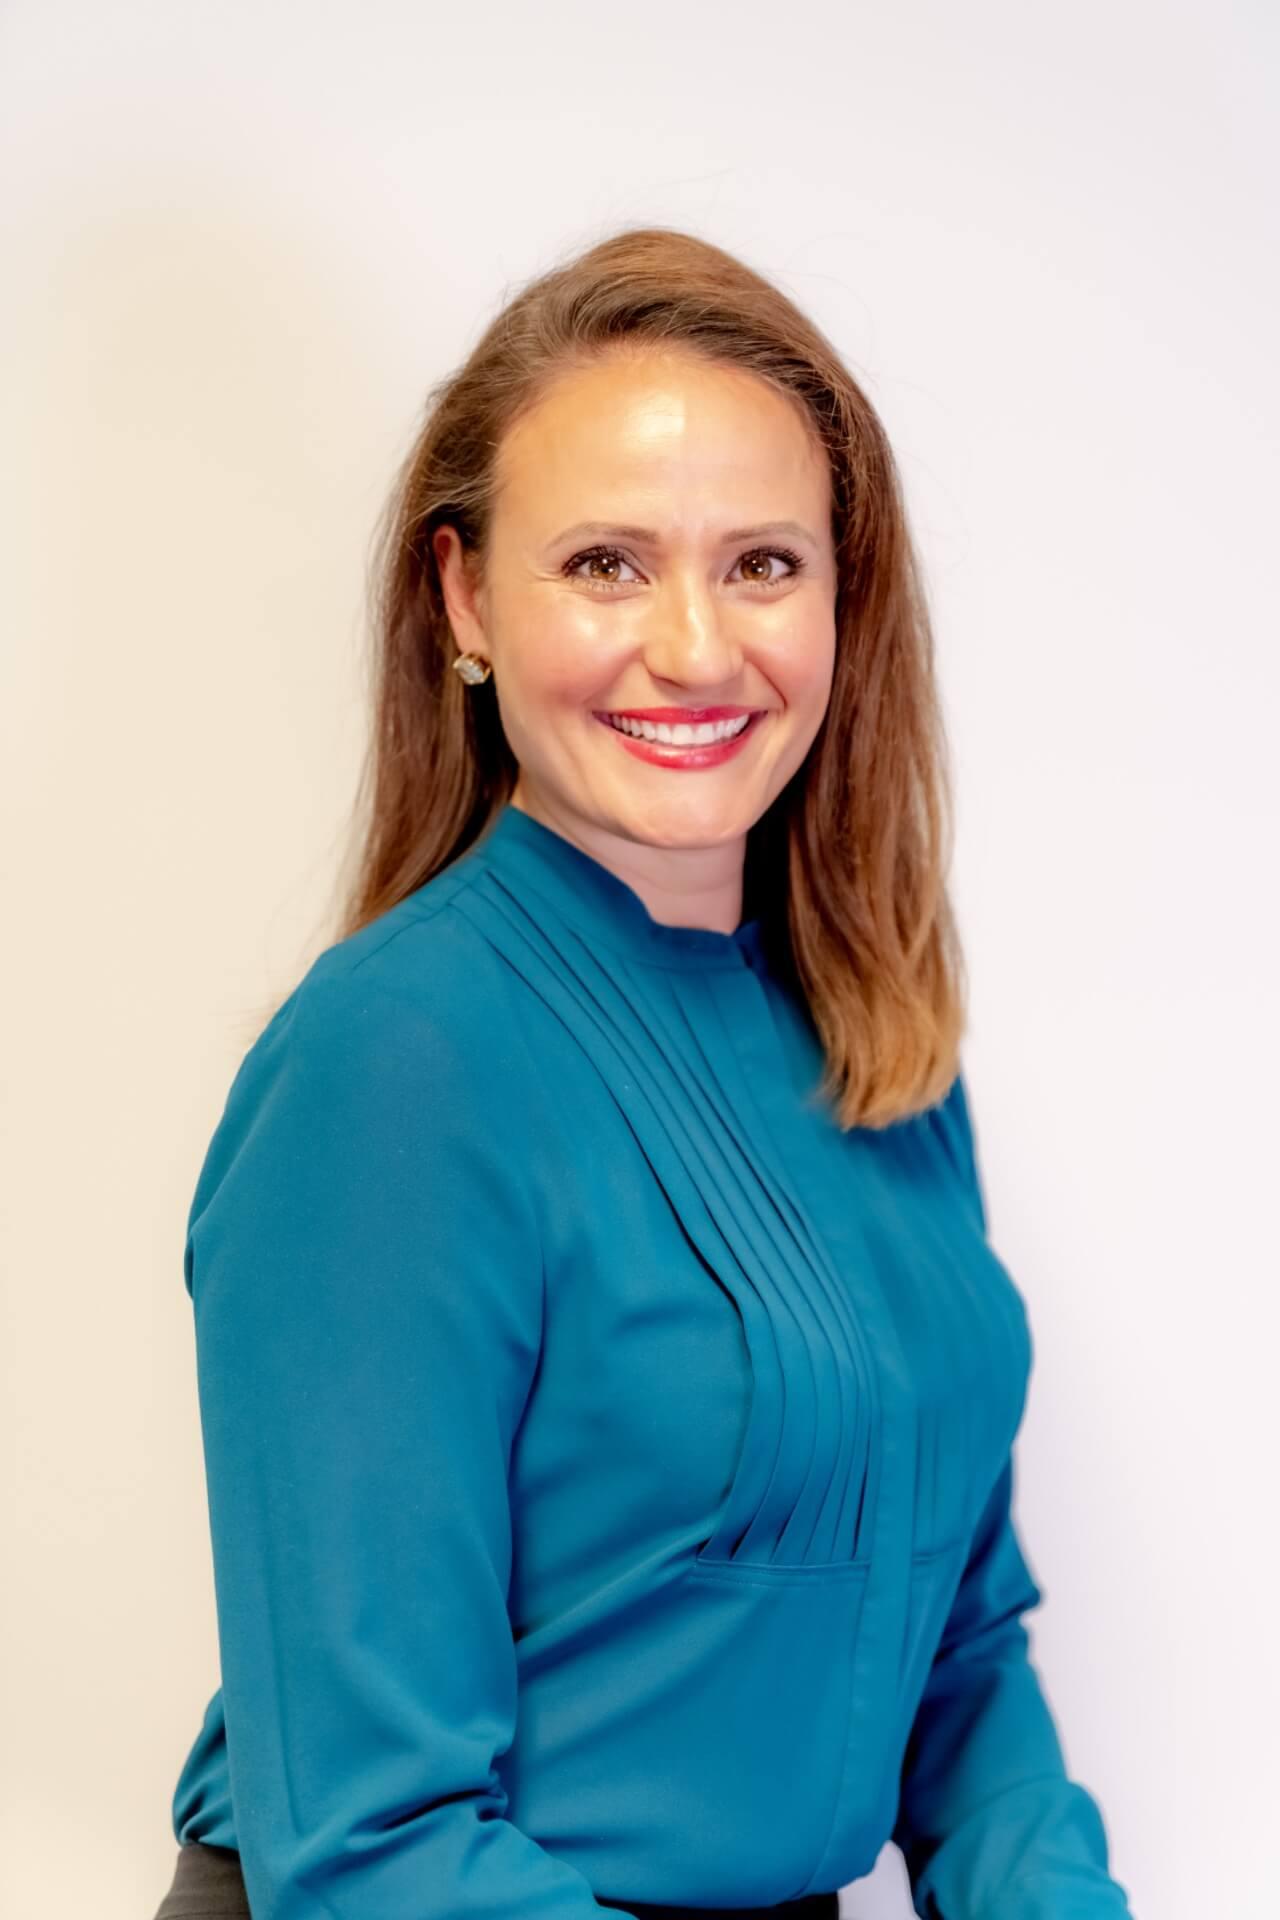 Dr. Megan Kottman is a great dentist in Grove City, Ohio